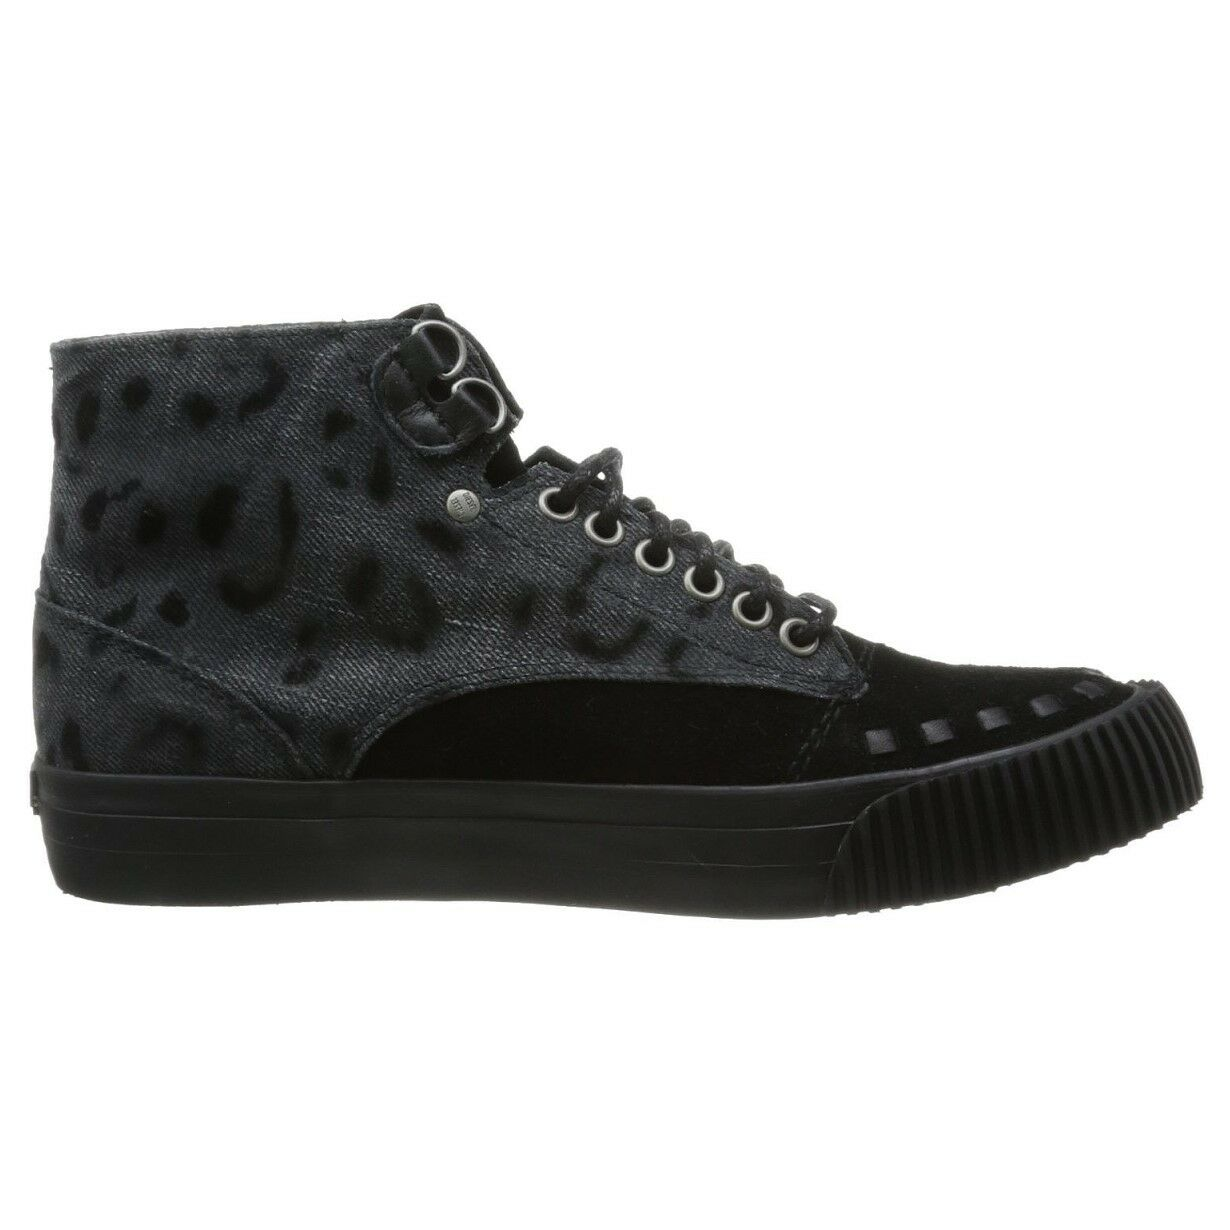 Diesel Leopard Laika Persis W Mid Leopard Diesel Print Damen Sneaker Trainers Schuhes Schuhe 70e163